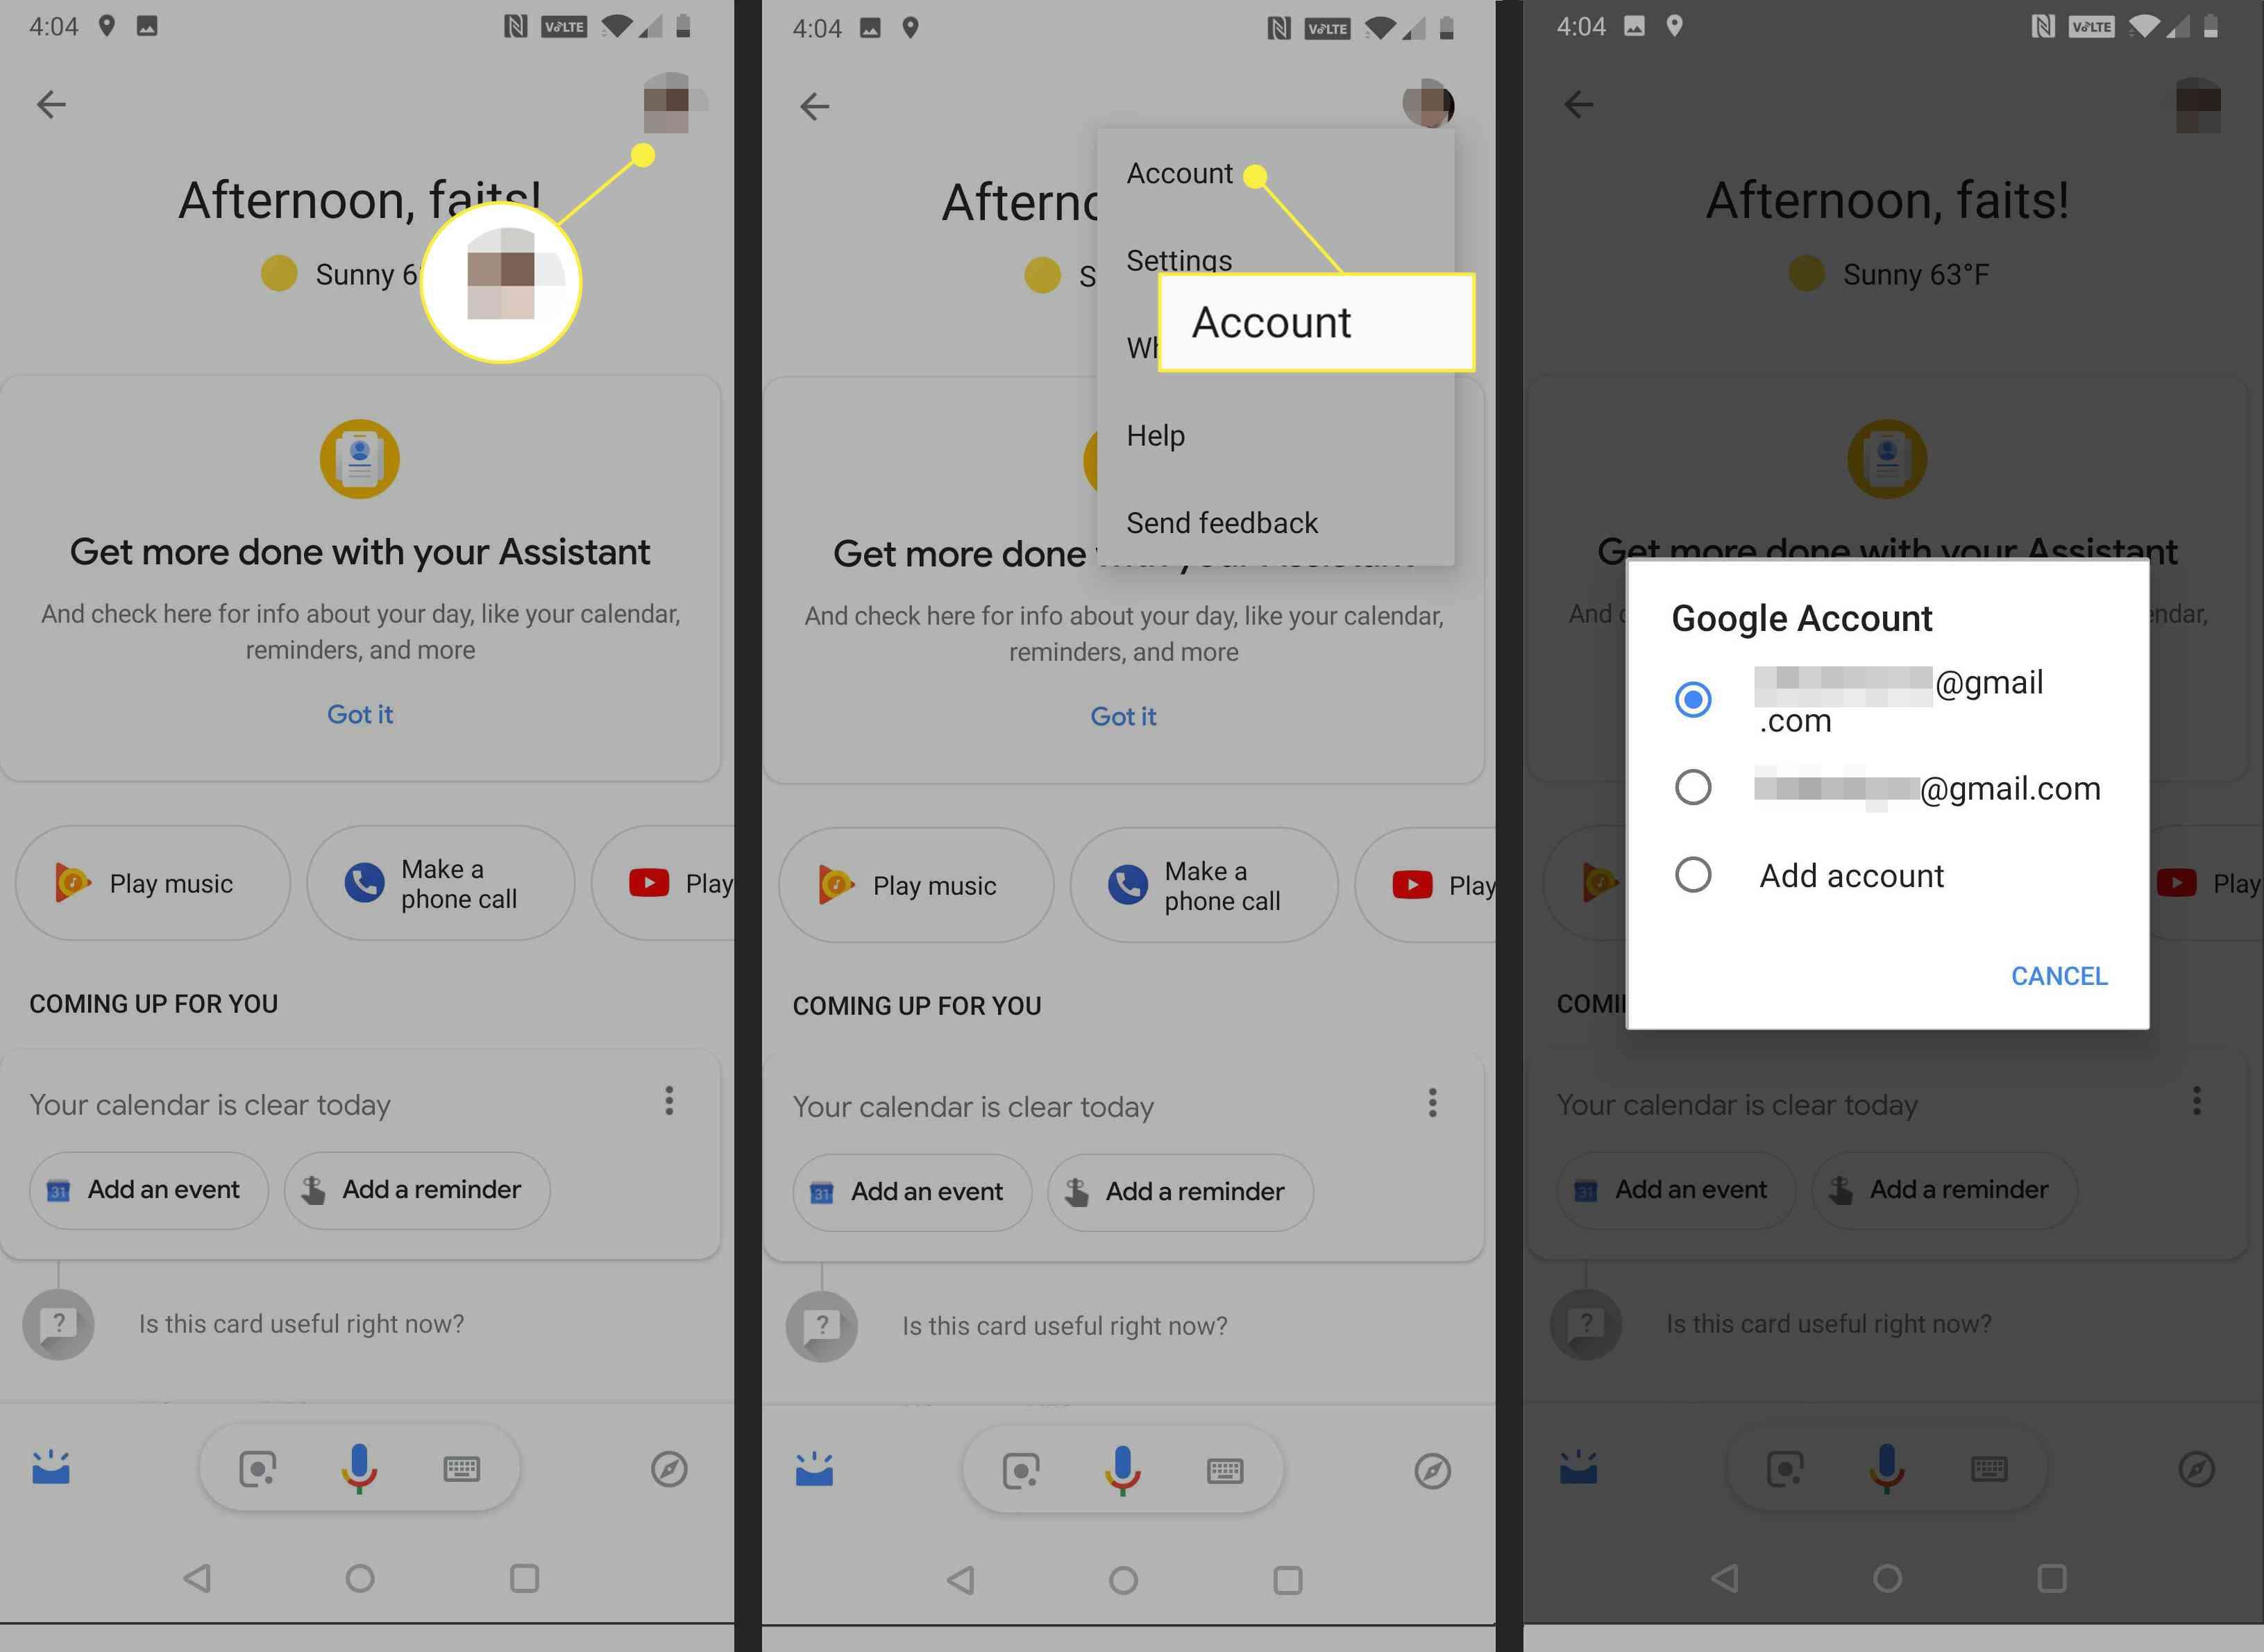 Selecting Google Account